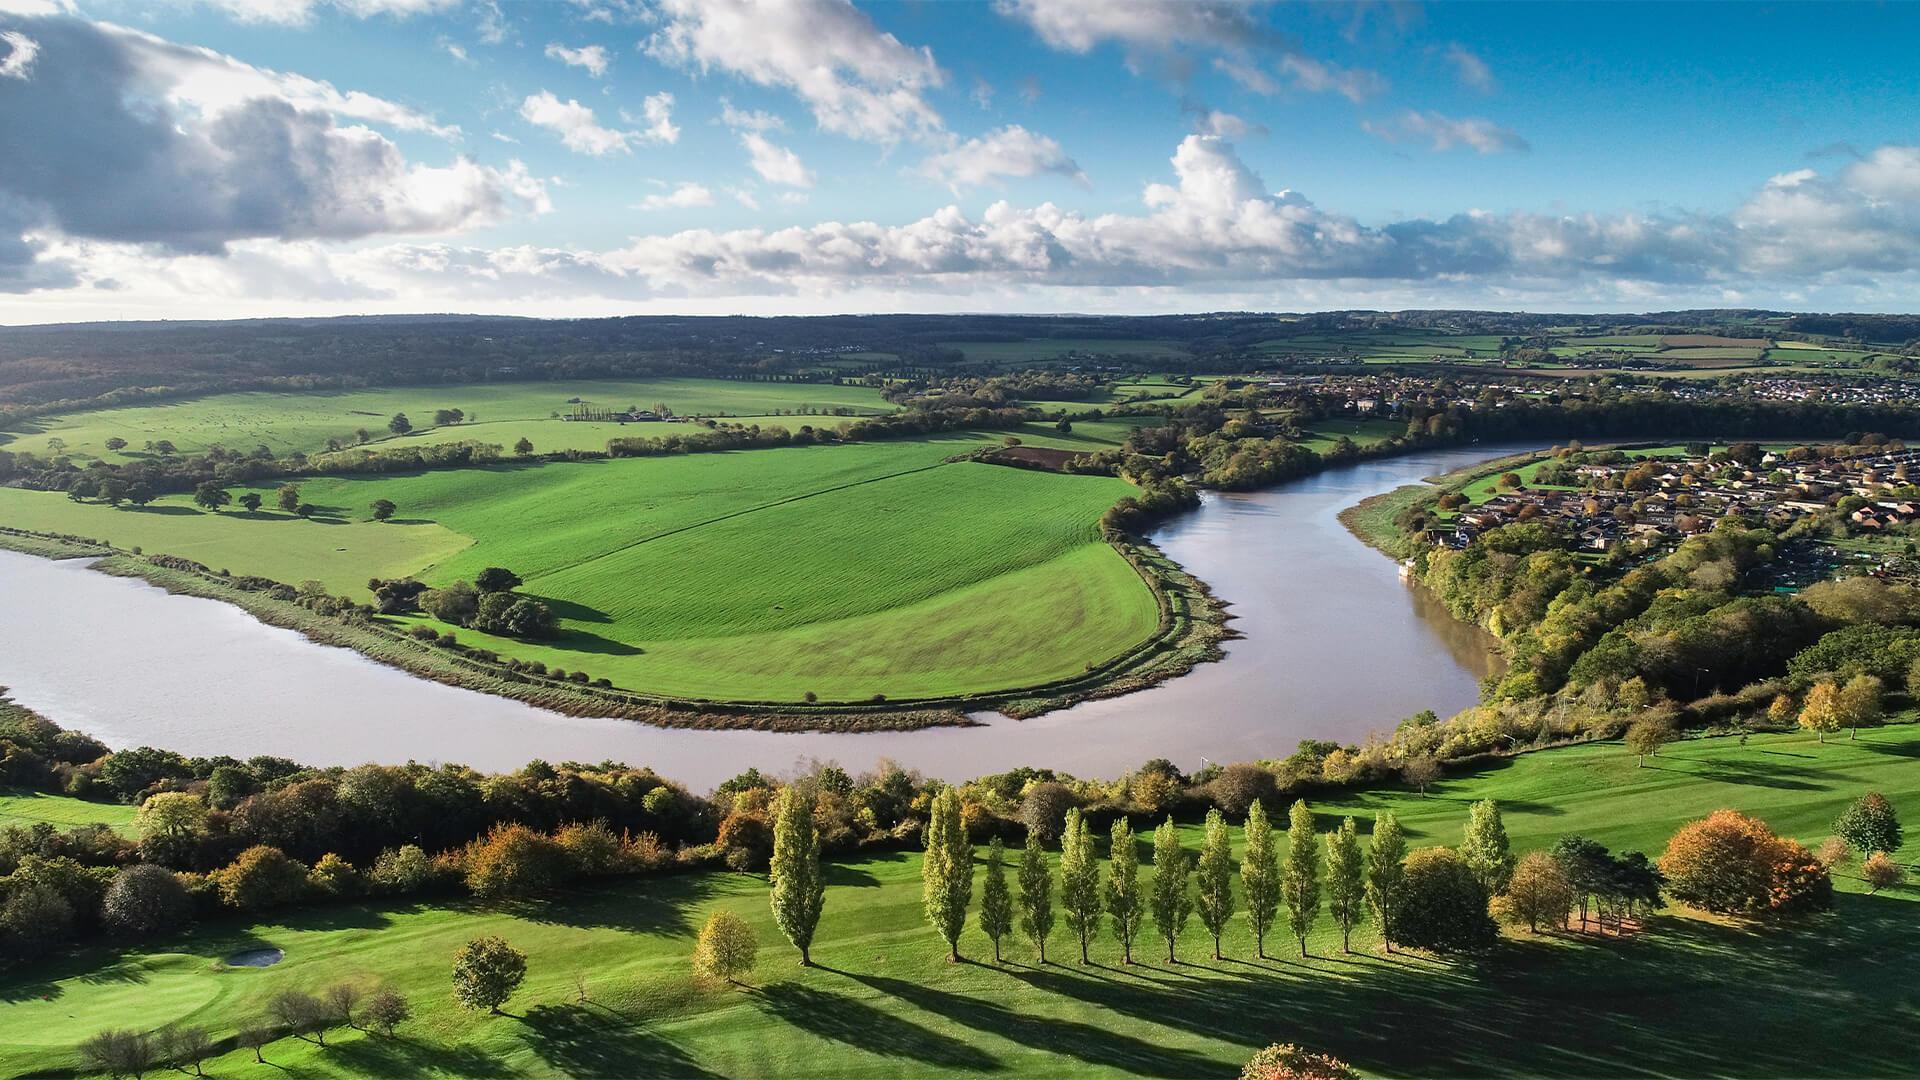 River Severn in Bristol